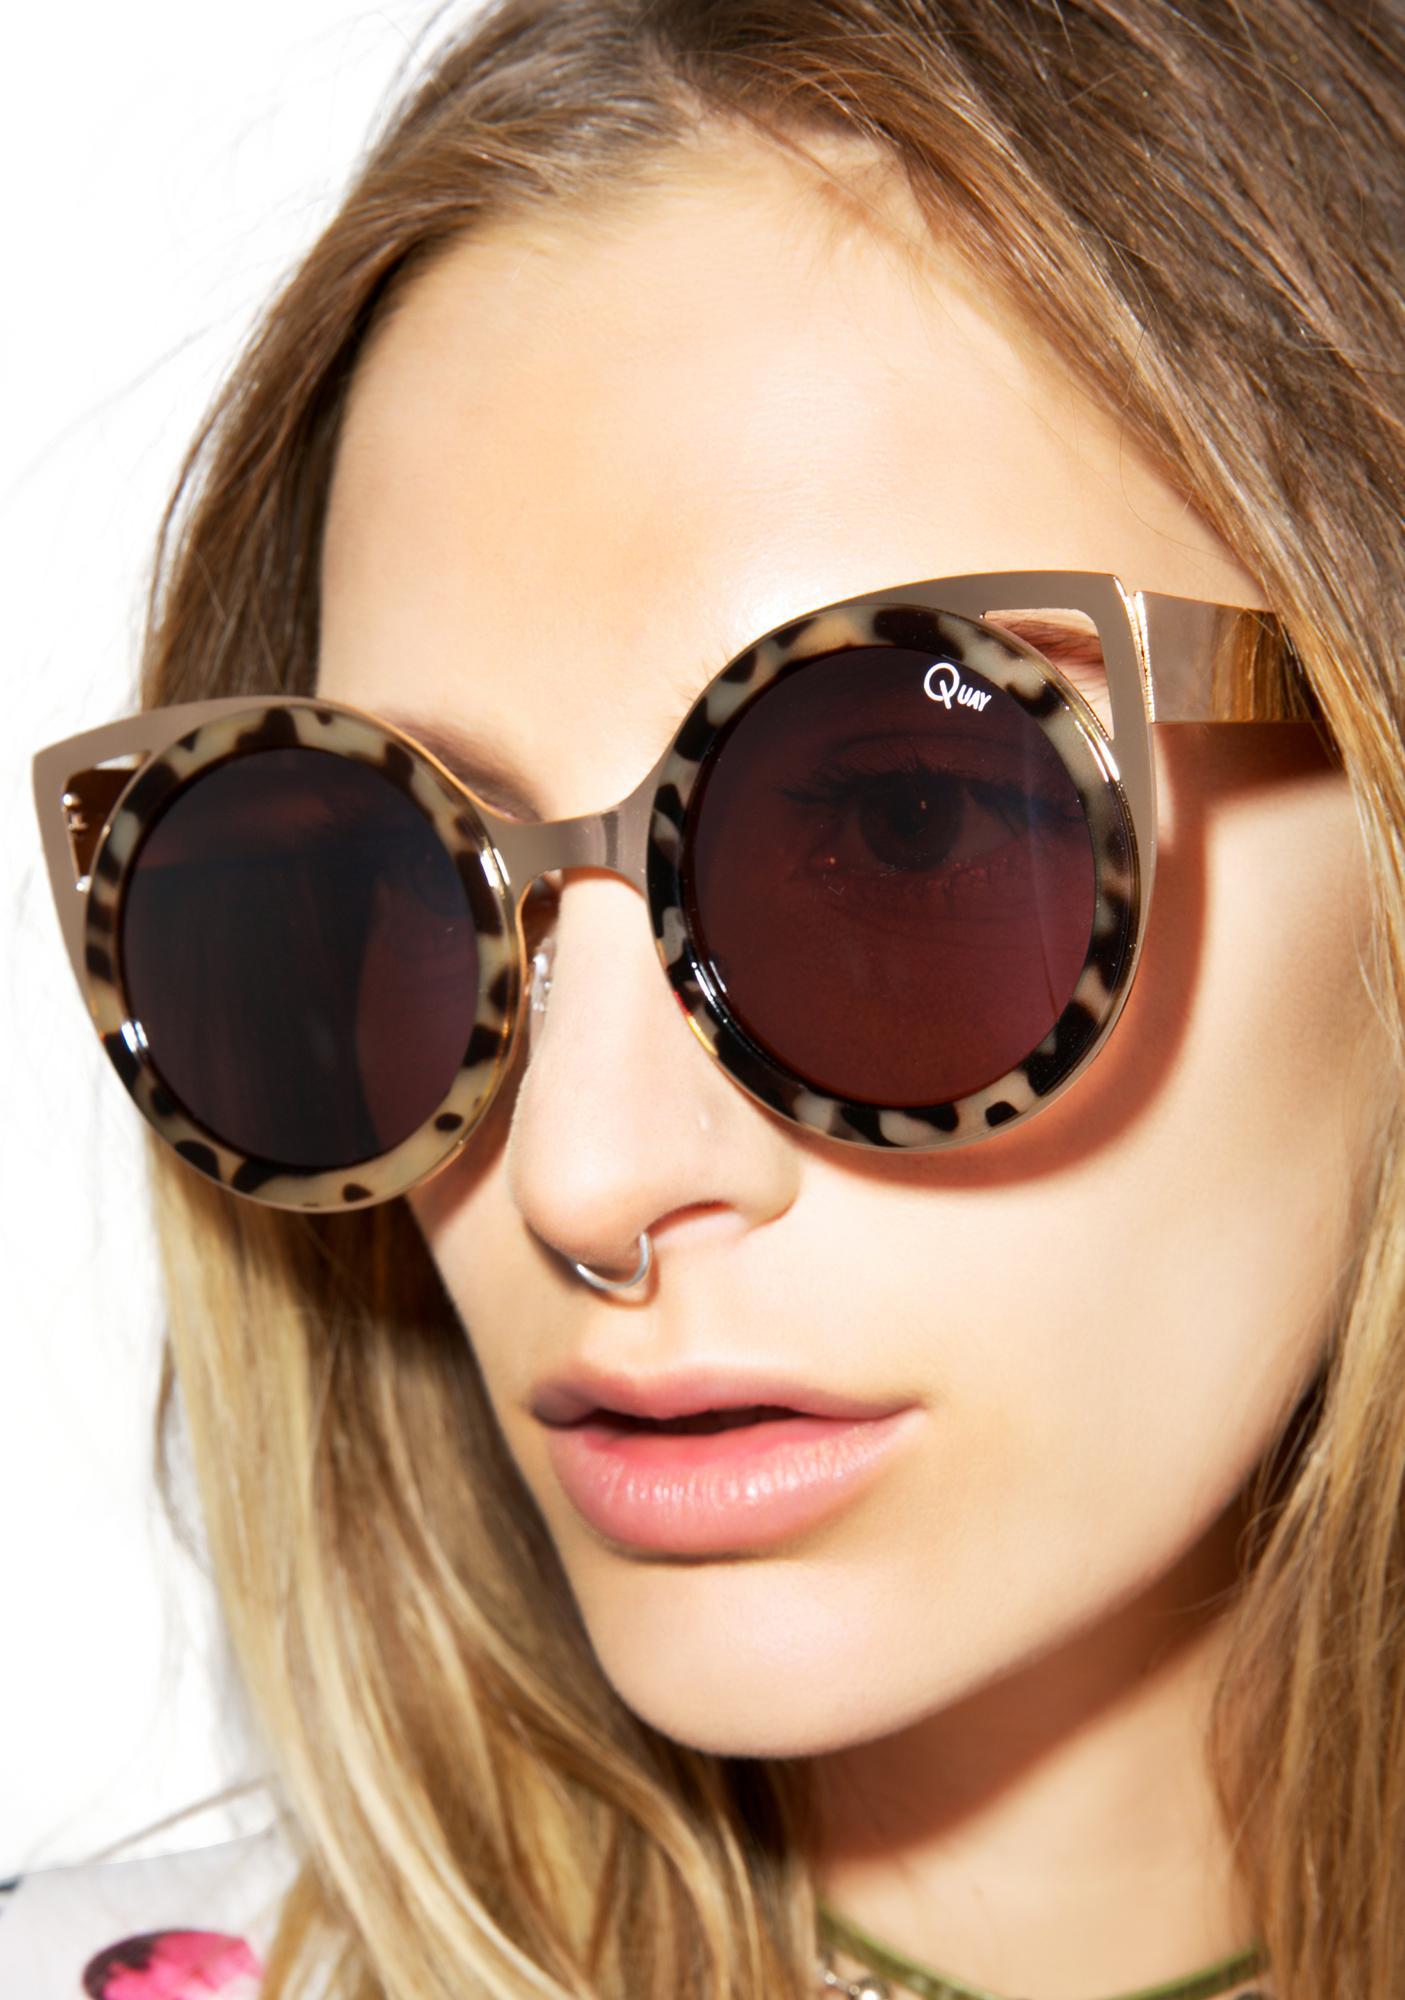 Quay Eyeware Let's Dance Sunglasses